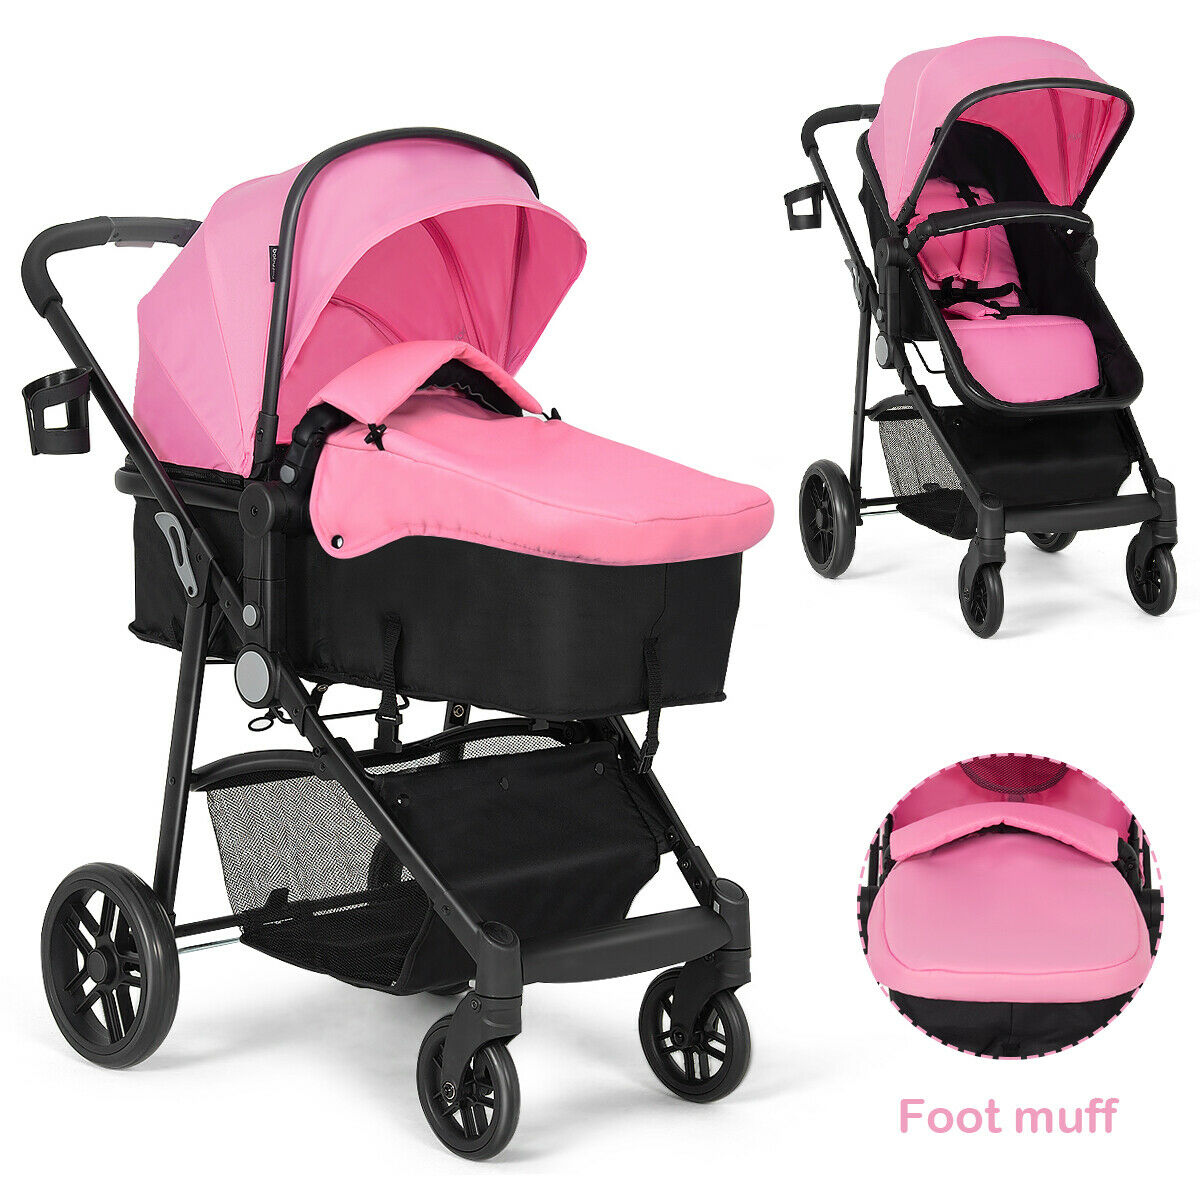 2 In1 عربة أطفال قابلة للطي الاطفال السفر الوليد الرضع عربات التي تجرها الدواب يدفع باليد الوردي